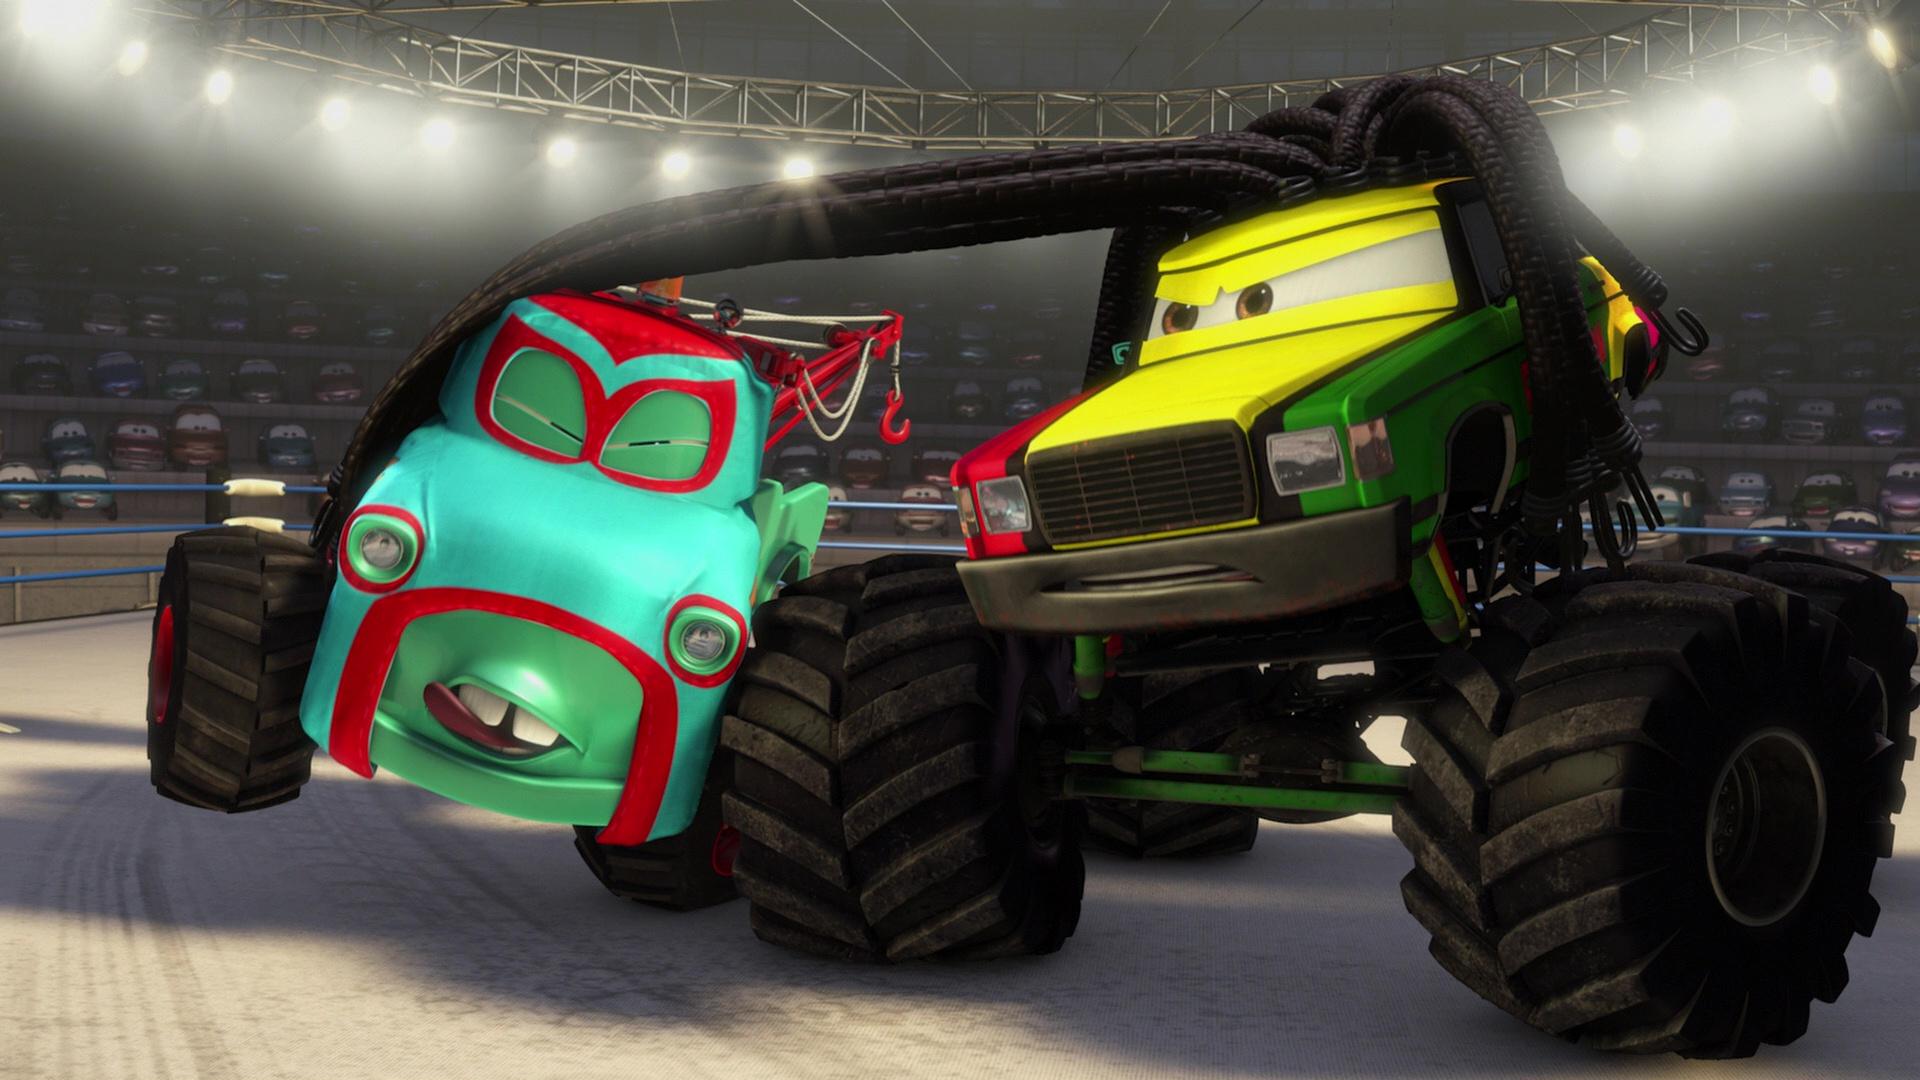 pixar disney personnage character  cars toon martin poids lourd monster truck mater Rastatineur rasta carian